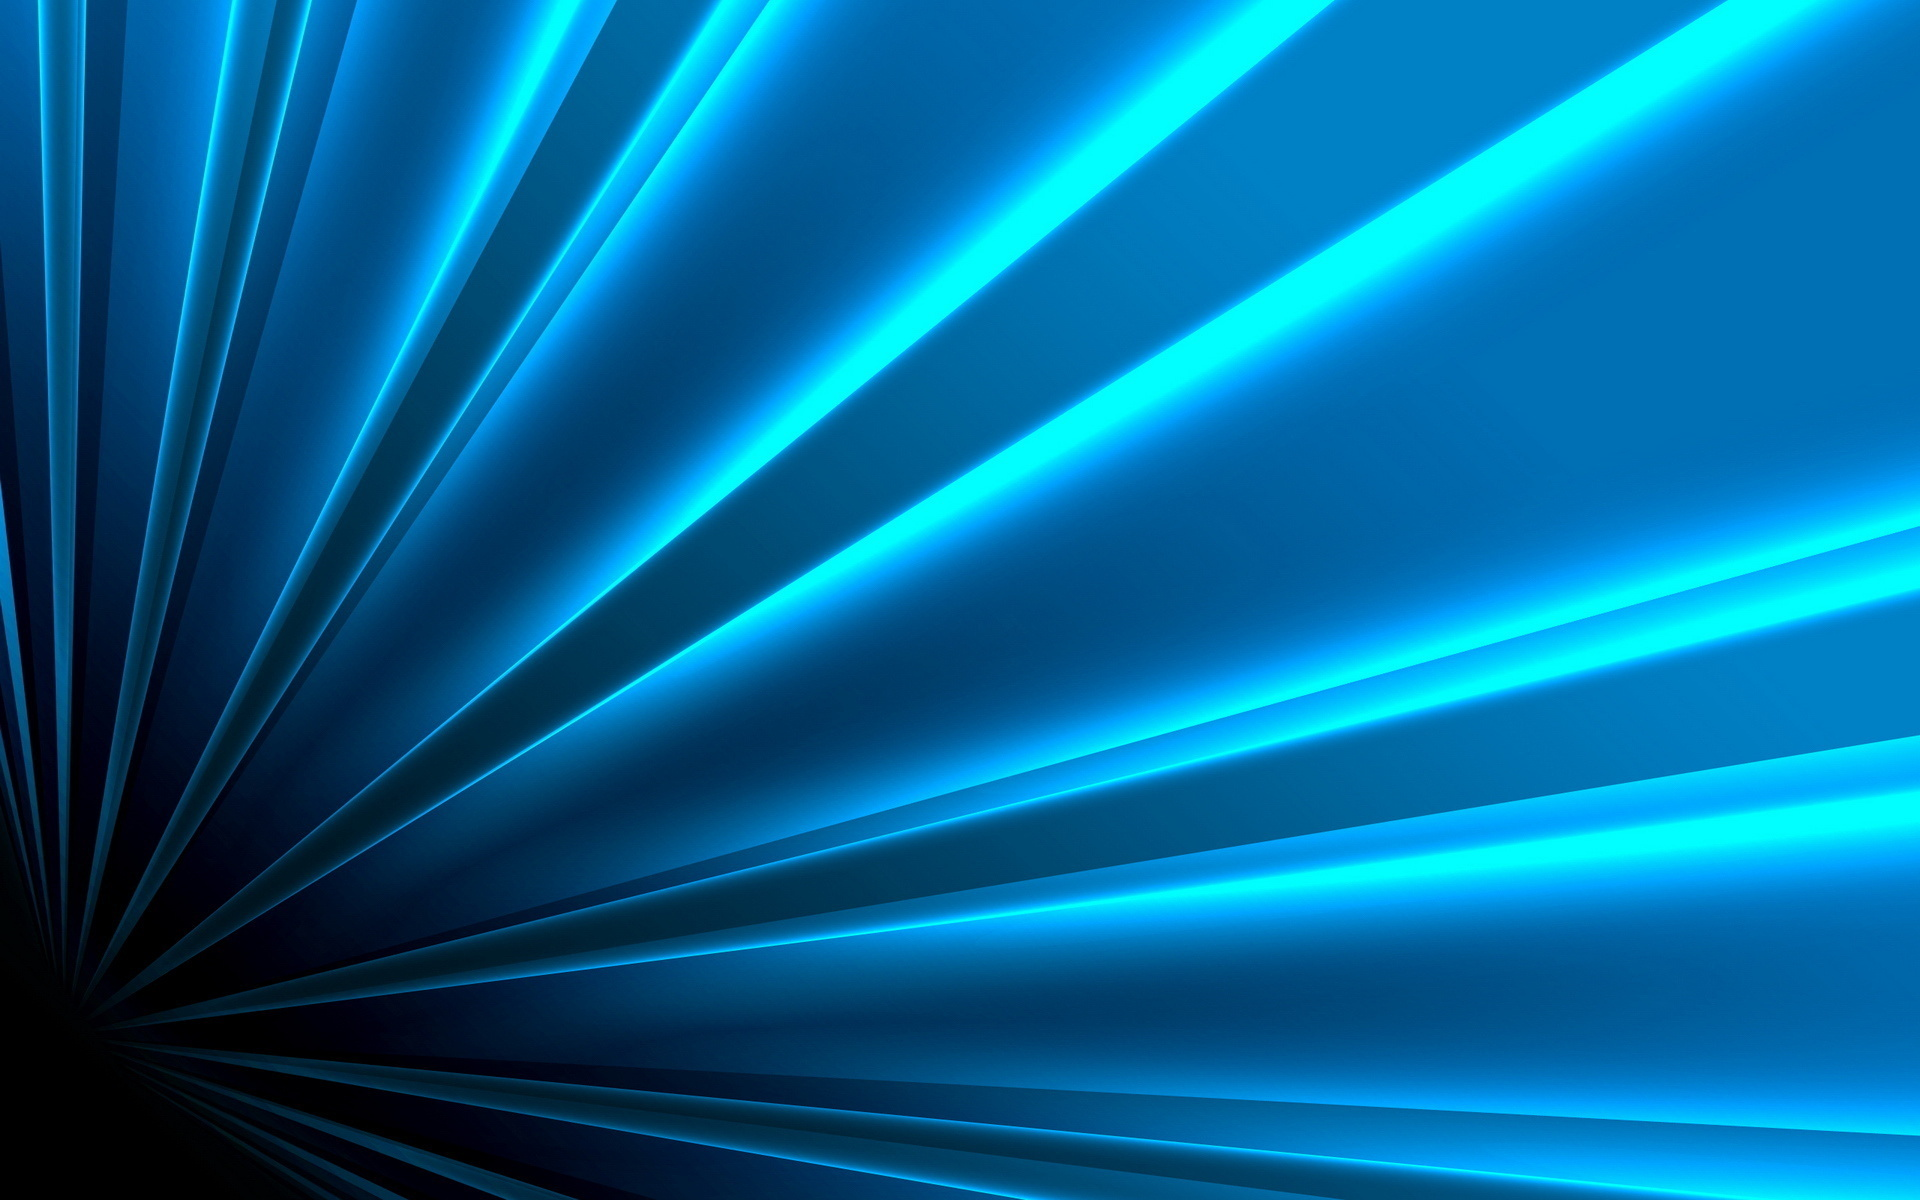 wallpapers azul,blue,green,light,aqua,electric blue